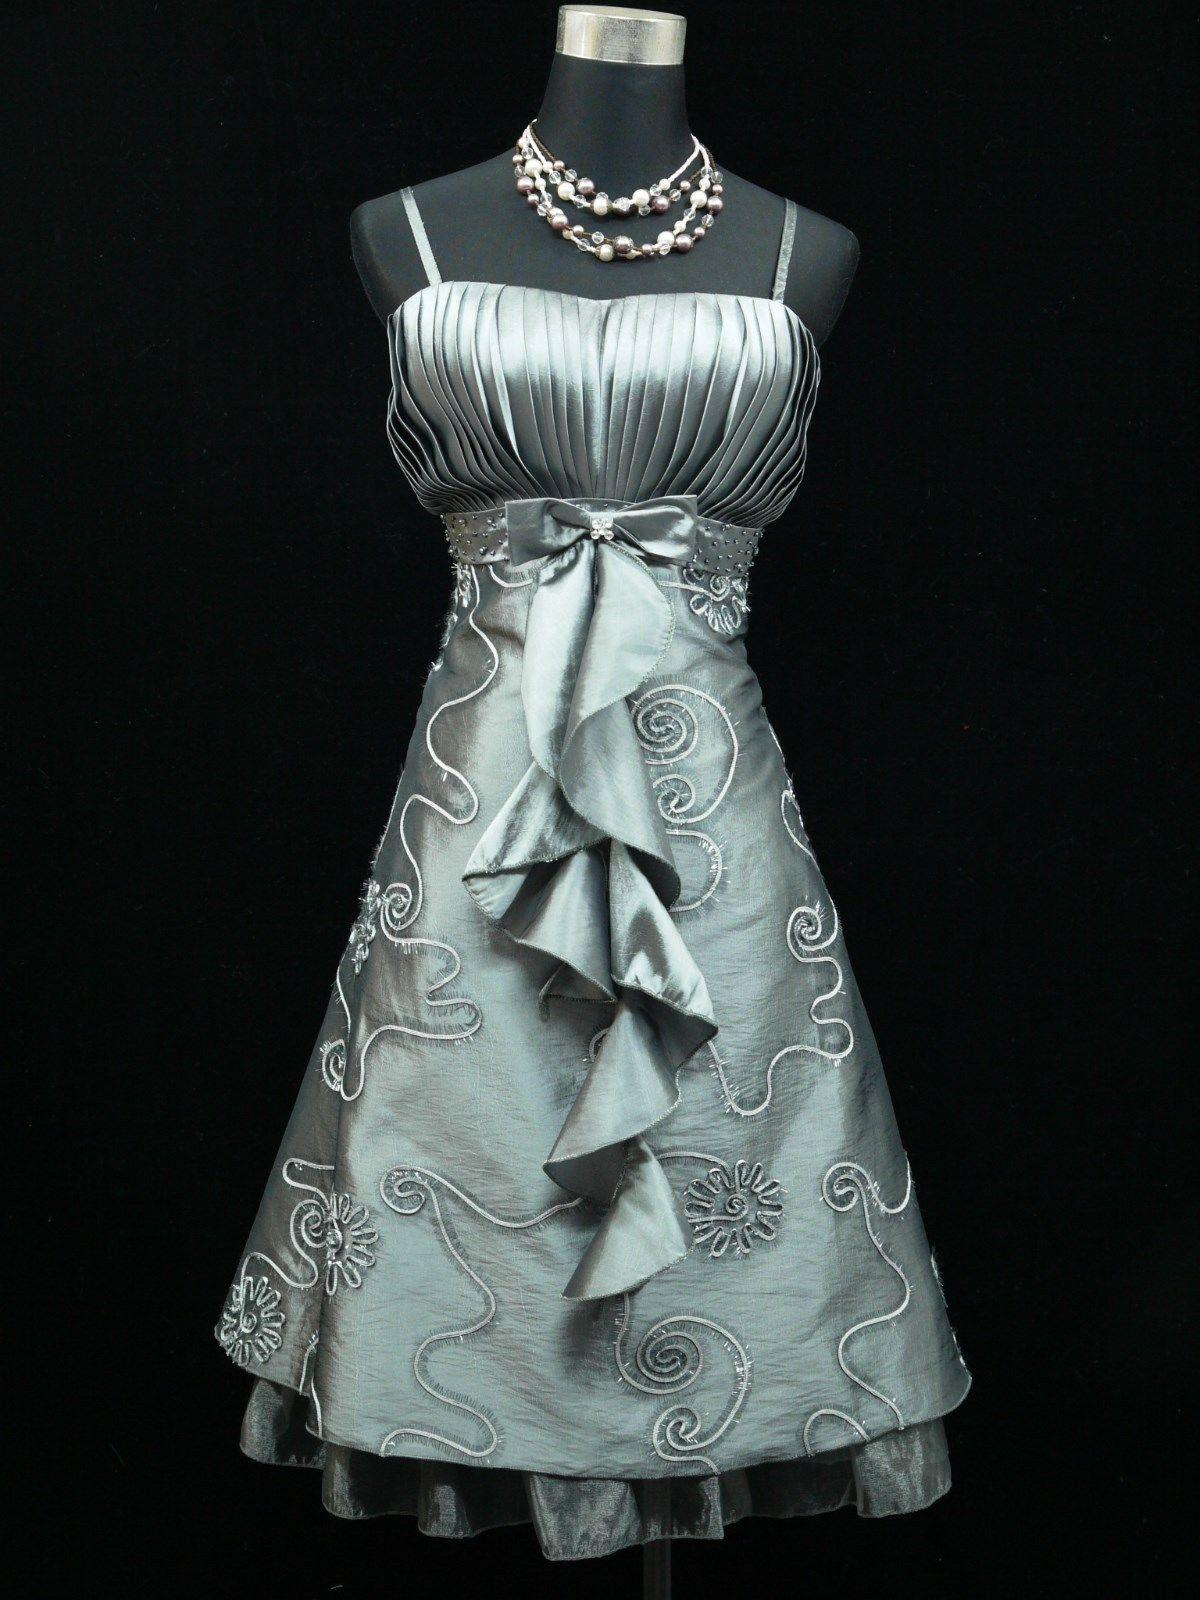 Cherlone Plus Size Grey Prom Ball Party Bridesmaid Wedding Evening Dress 24 https://t.co/iCz0Oq7MNt https://t.co/YJ5MKwaBA3